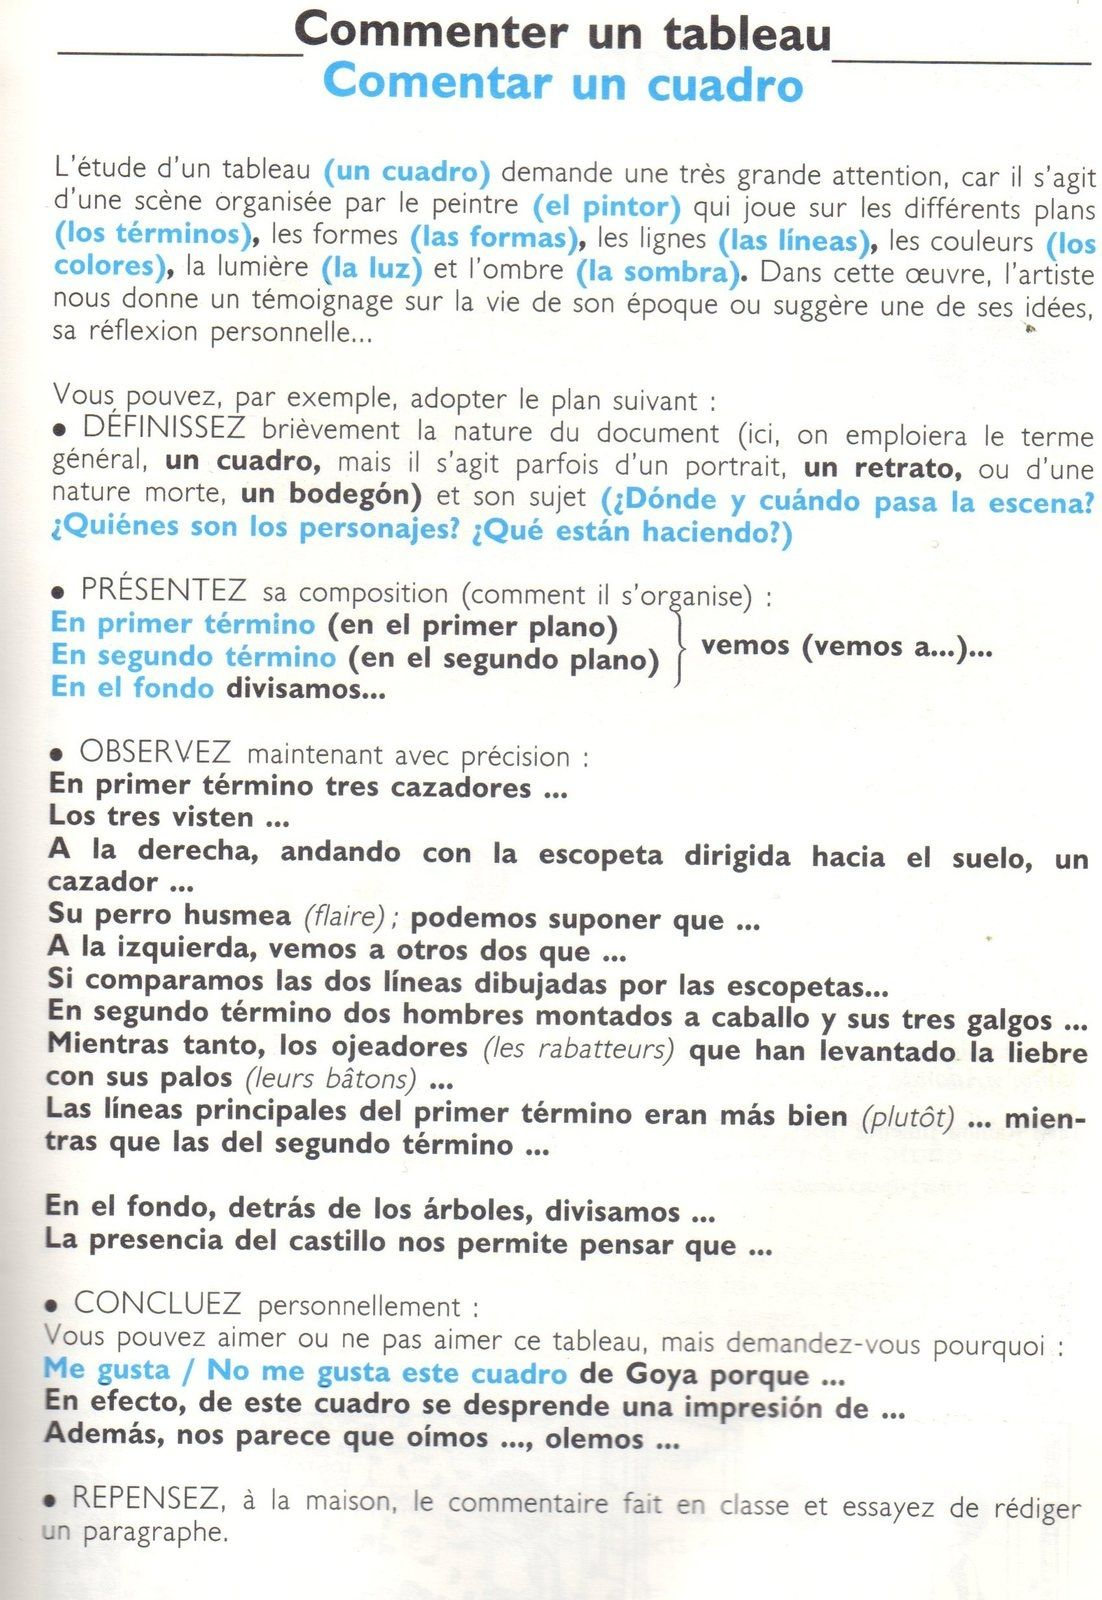 Epingle Par Ole Lardy Sur Metodologia Enseigner L Espagnol Bac Espagnol Espagnol